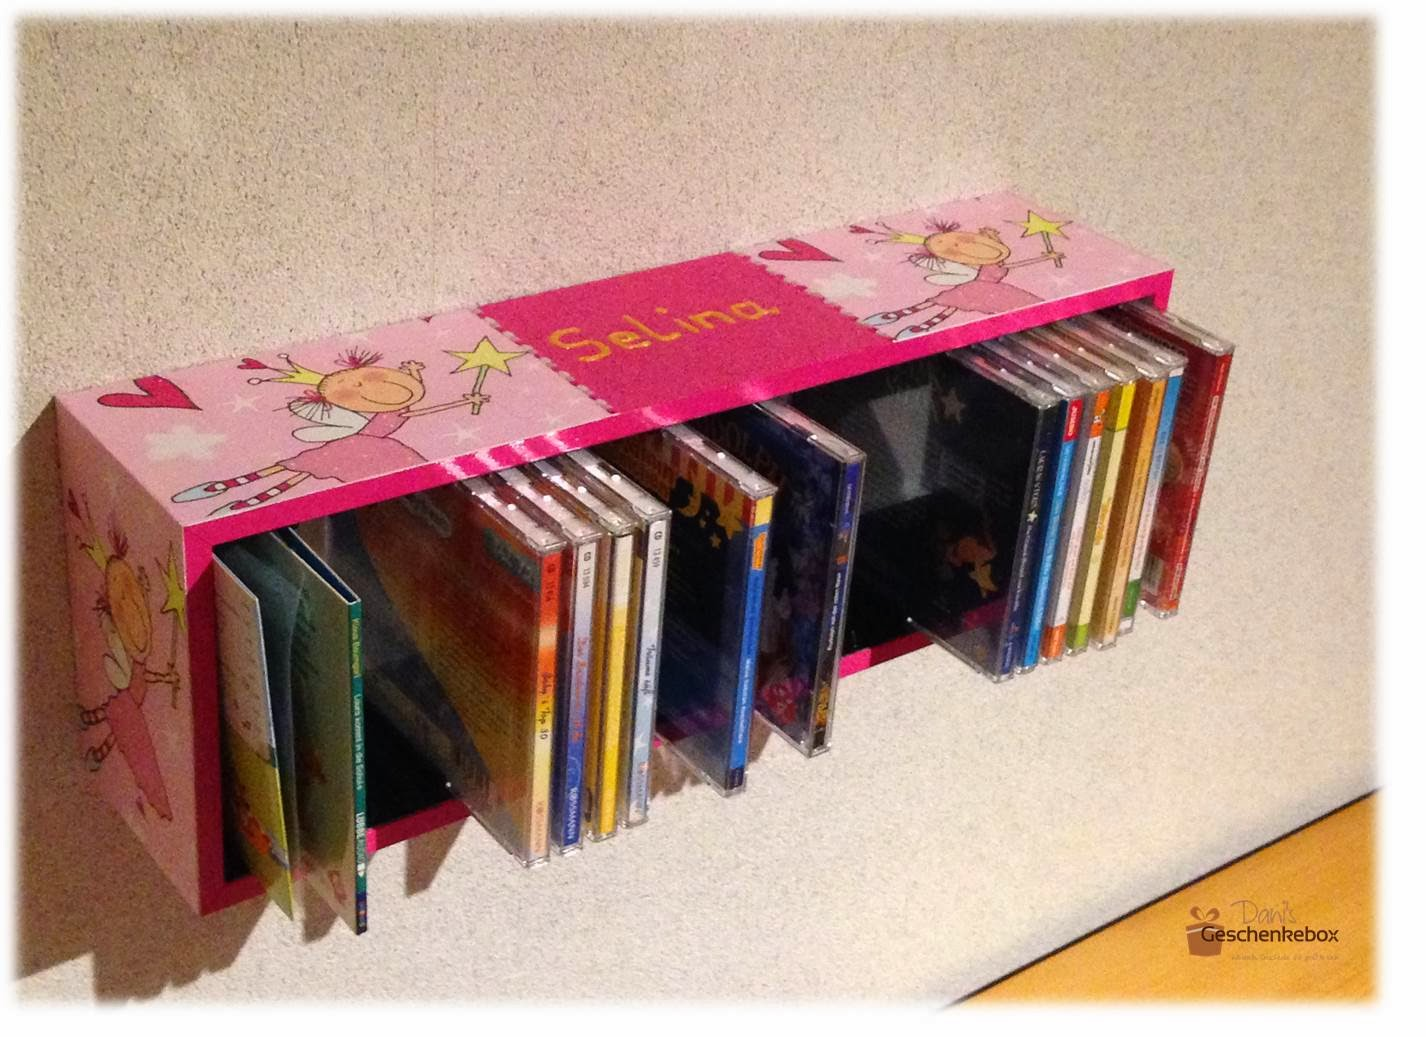 cd regale f r kinder dani 39 s geschenkebox auf ezebee. Black Bedroom Furniture Sets. Home Design Ideas